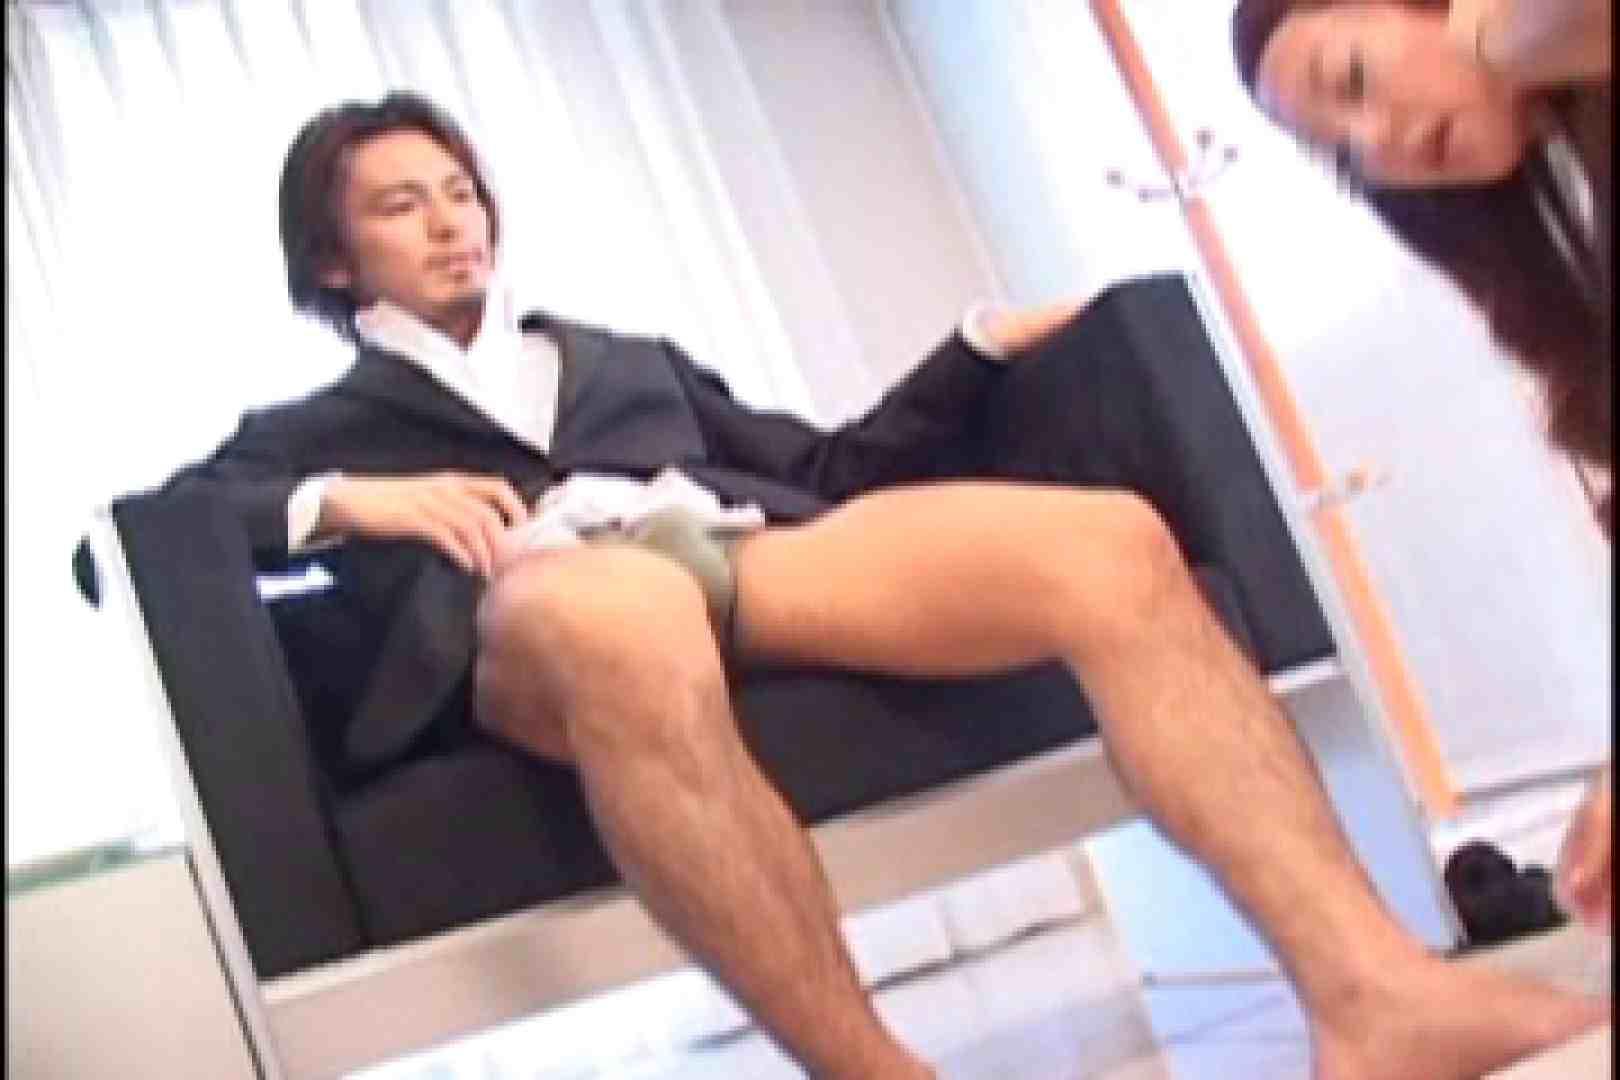 BEST OF イケメン!!男目線のガチSEX vol.06(対女性作品) ホスト ゲイアダルトビデオ画像 78枚 23